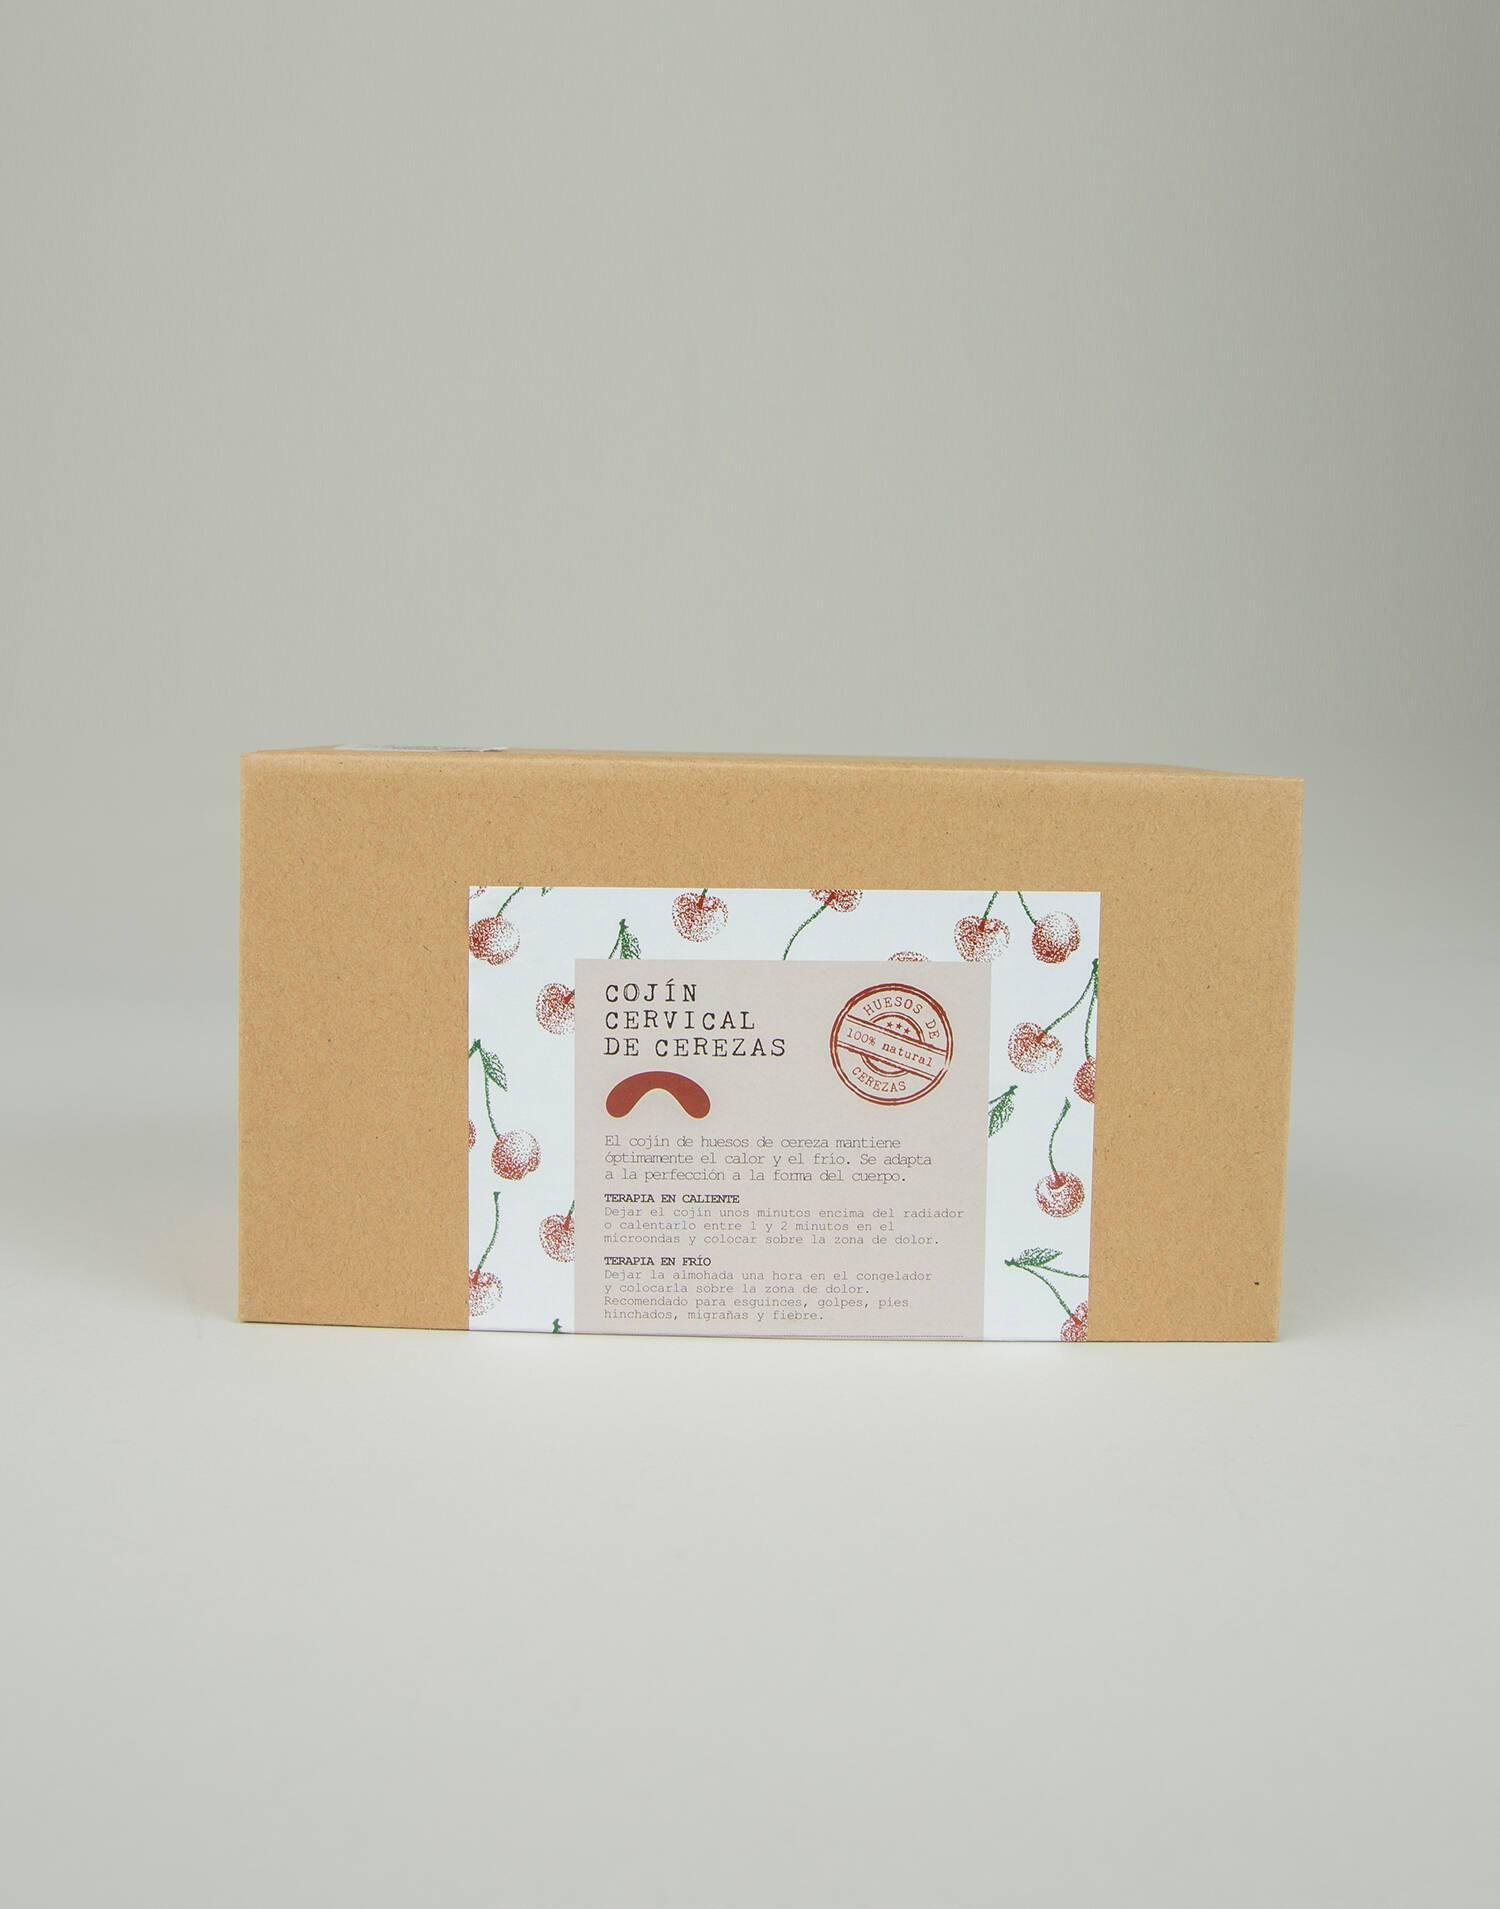 Cervical cerezas